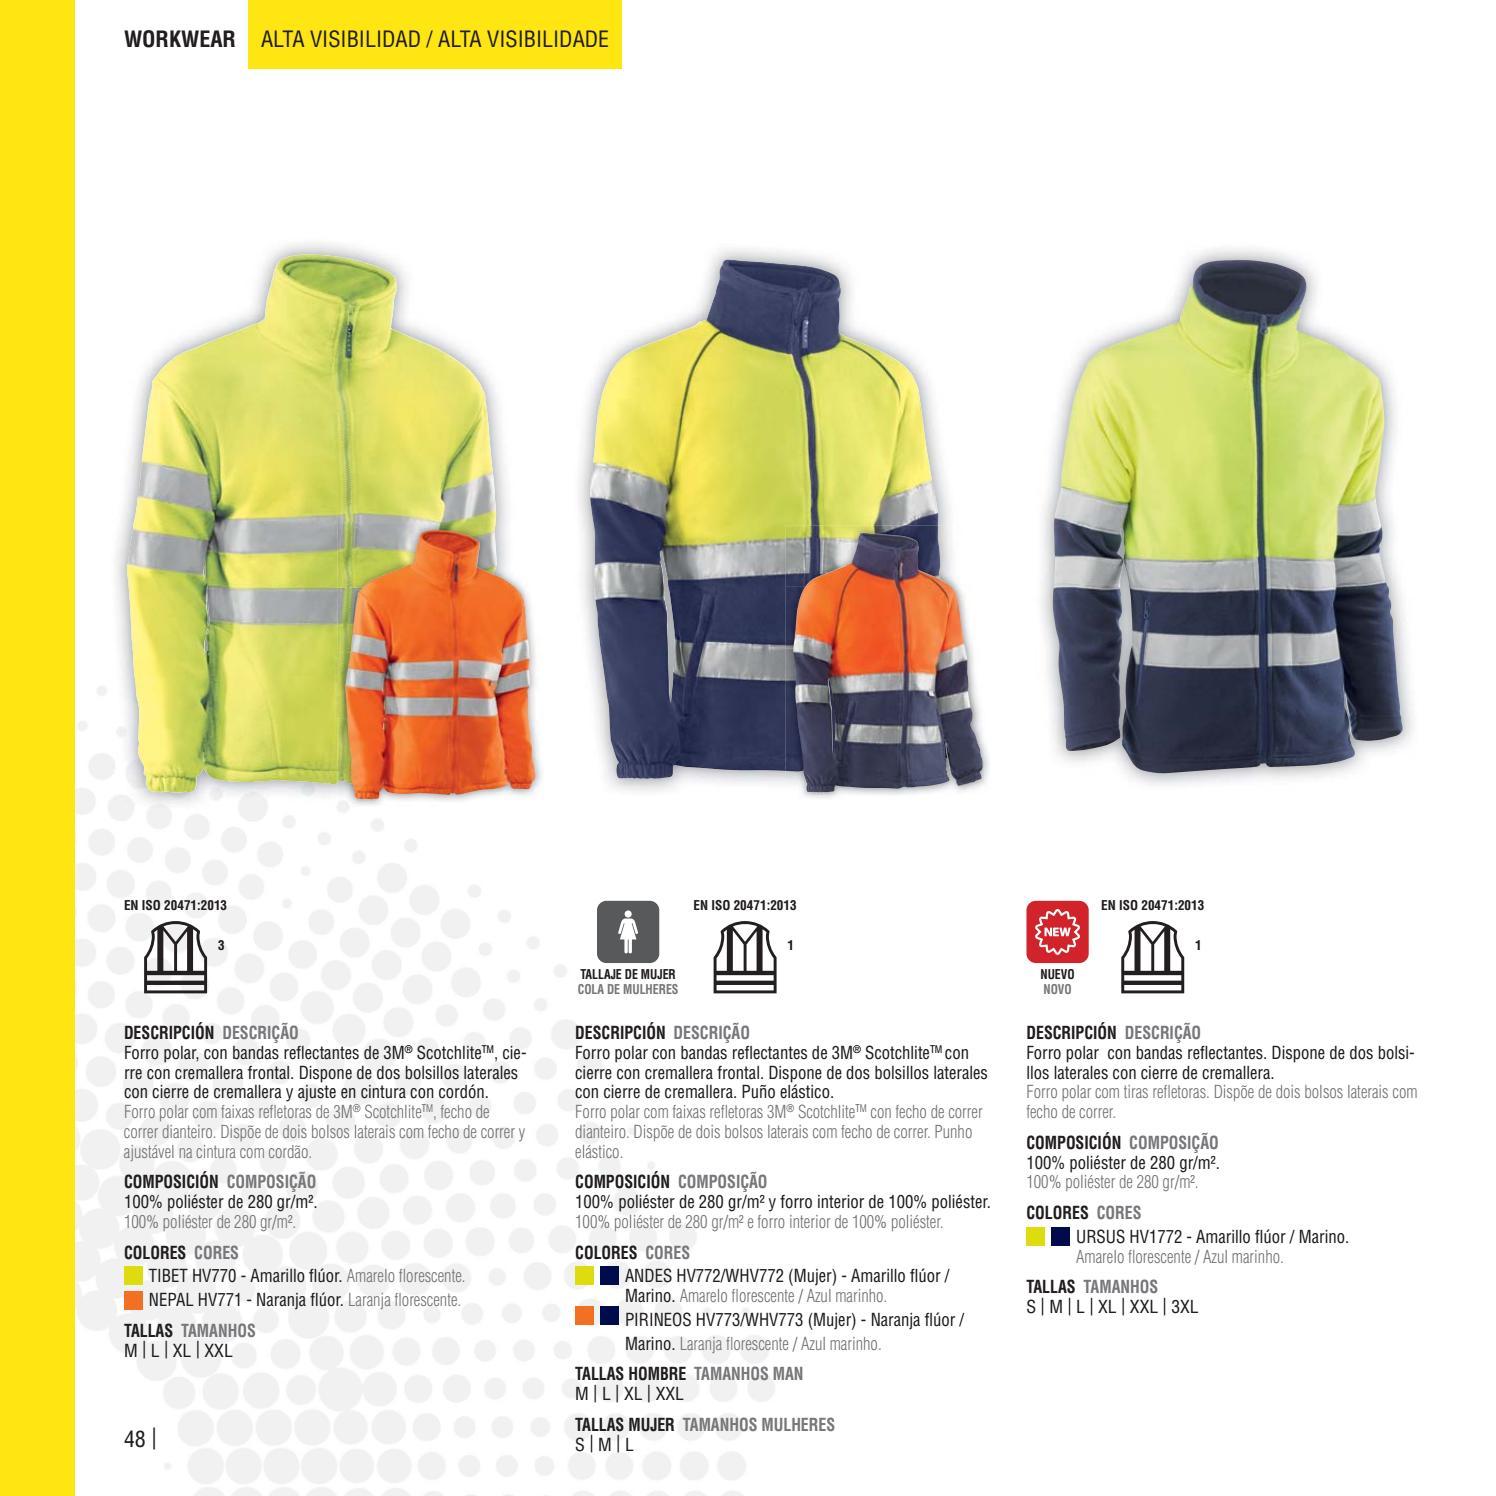 258d9d84e Juba catalogo general ropa 2016 17 es pt by Javier Martín - issuu